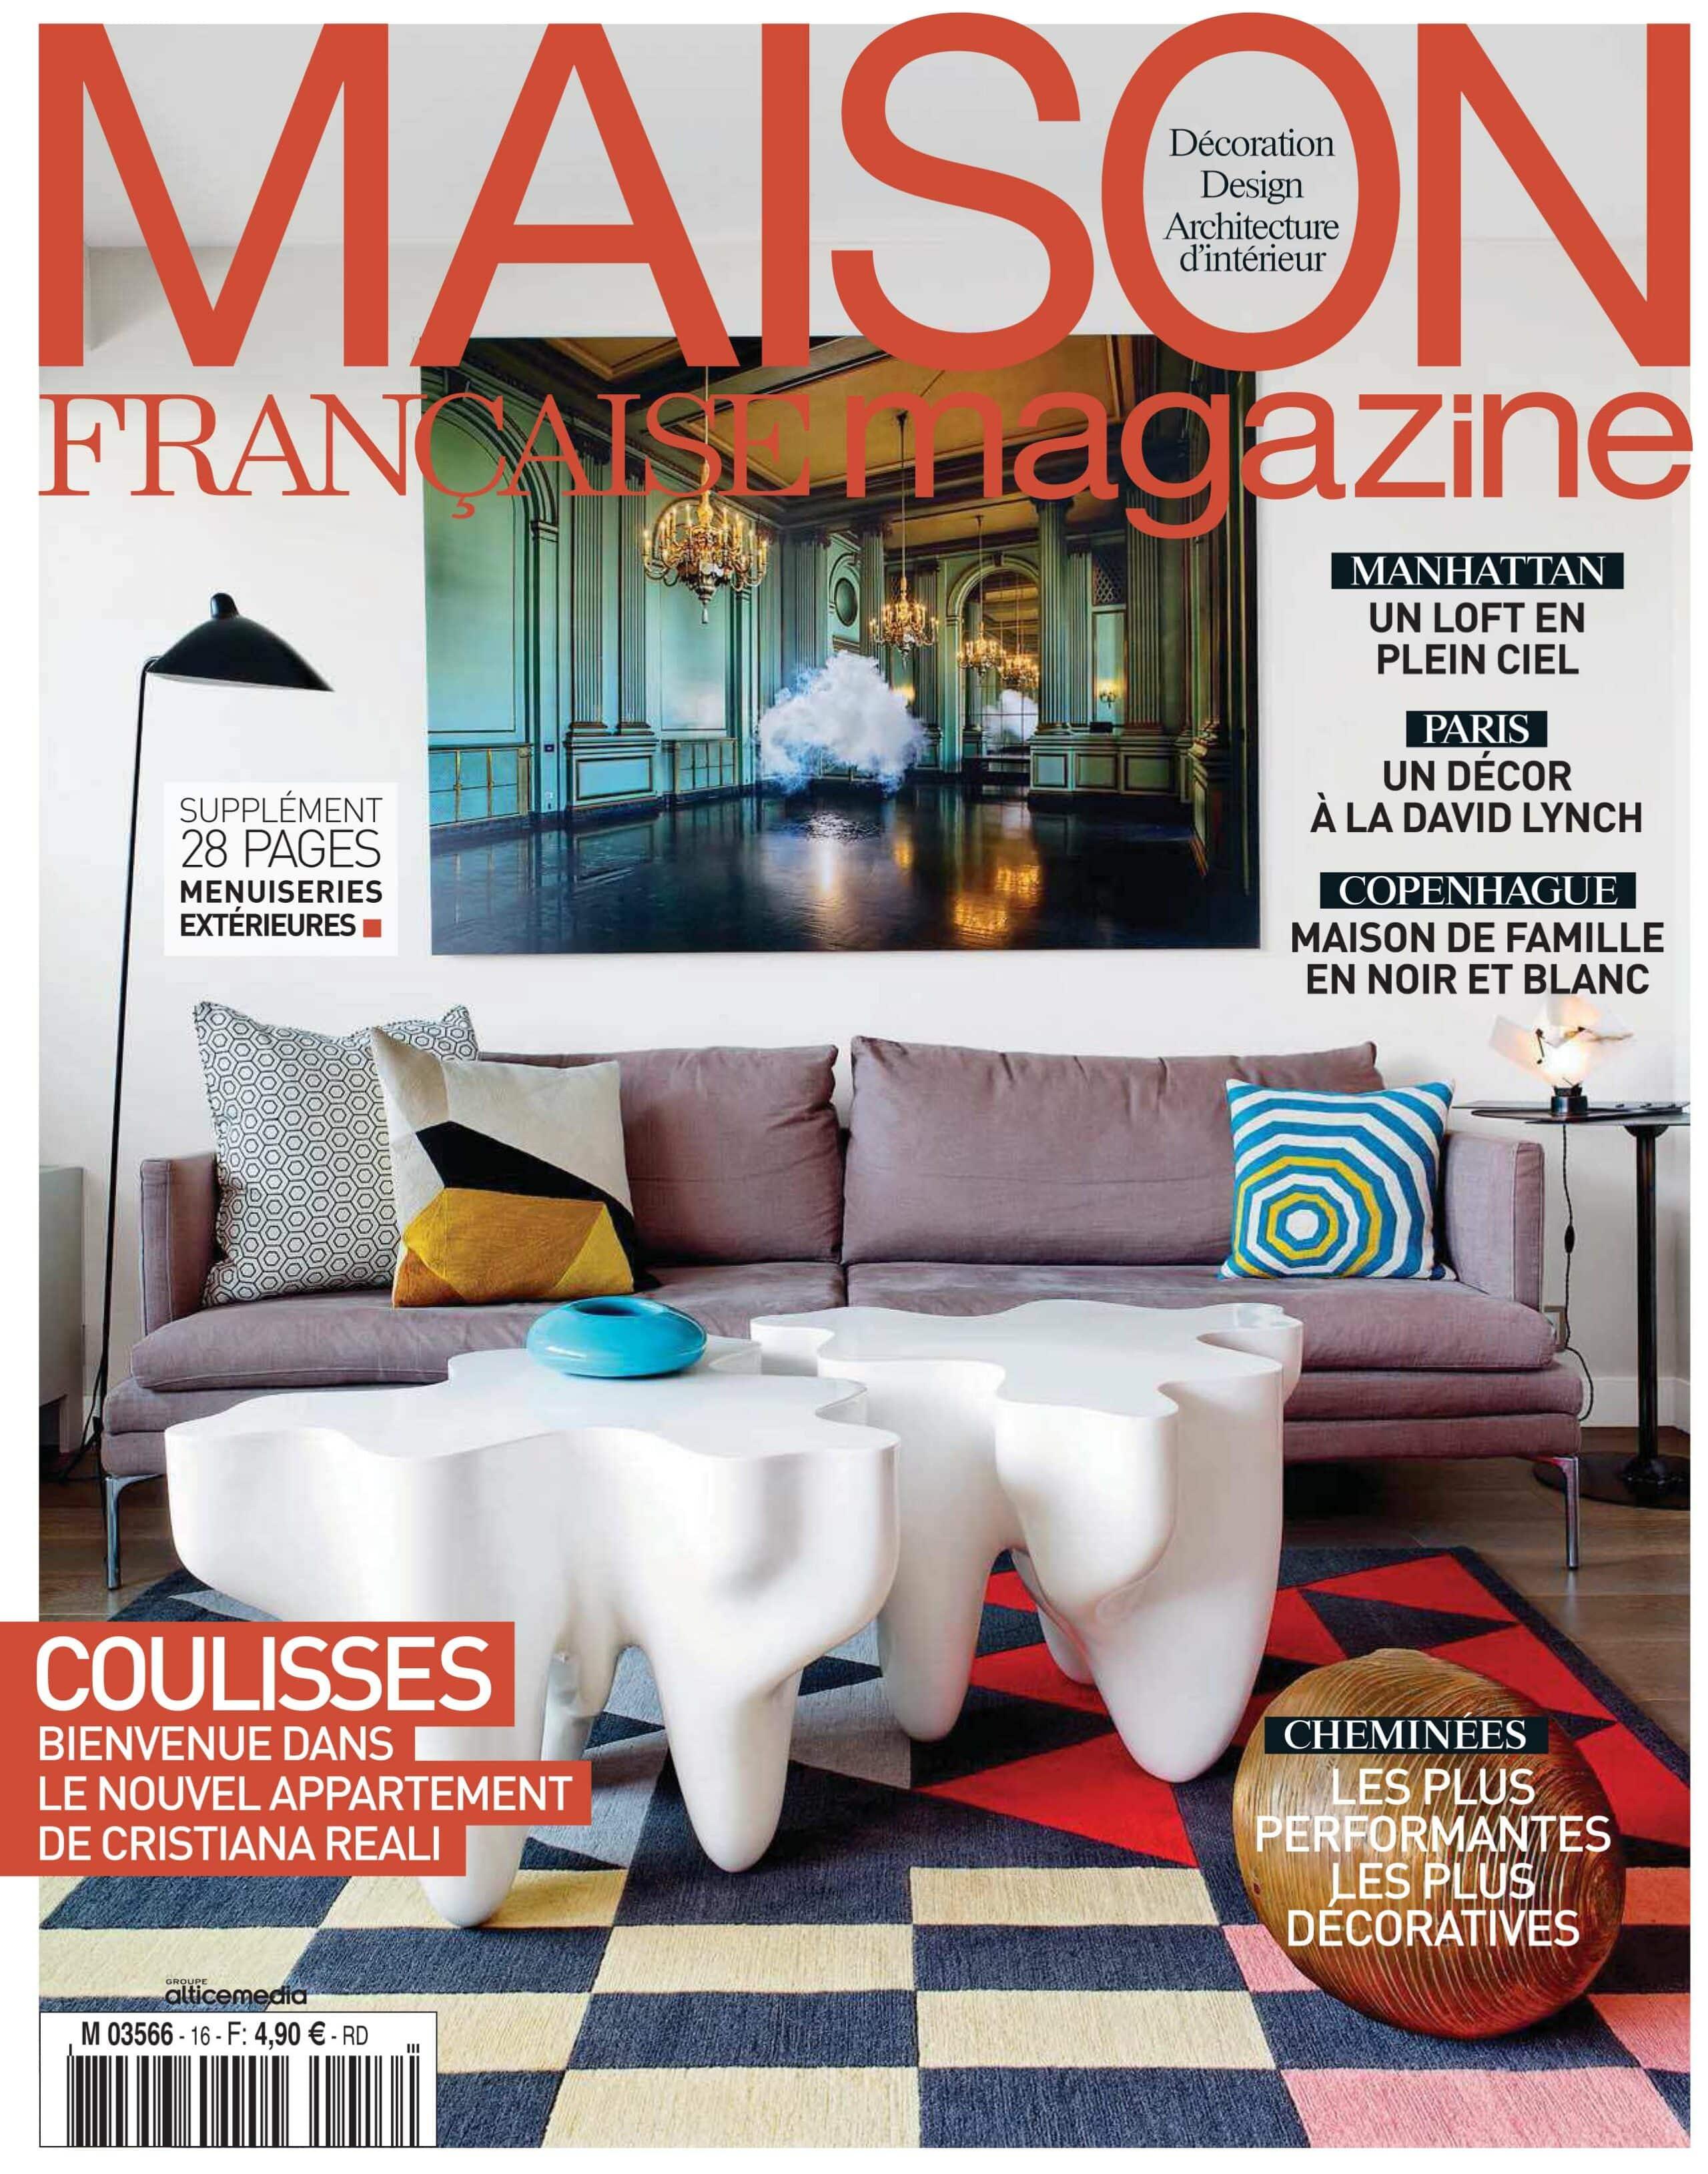 maison travaux magazine interesting produits with maison travaux magazine latest le numro de. Black Bedroom Furniture Sets. Home Design Ideas